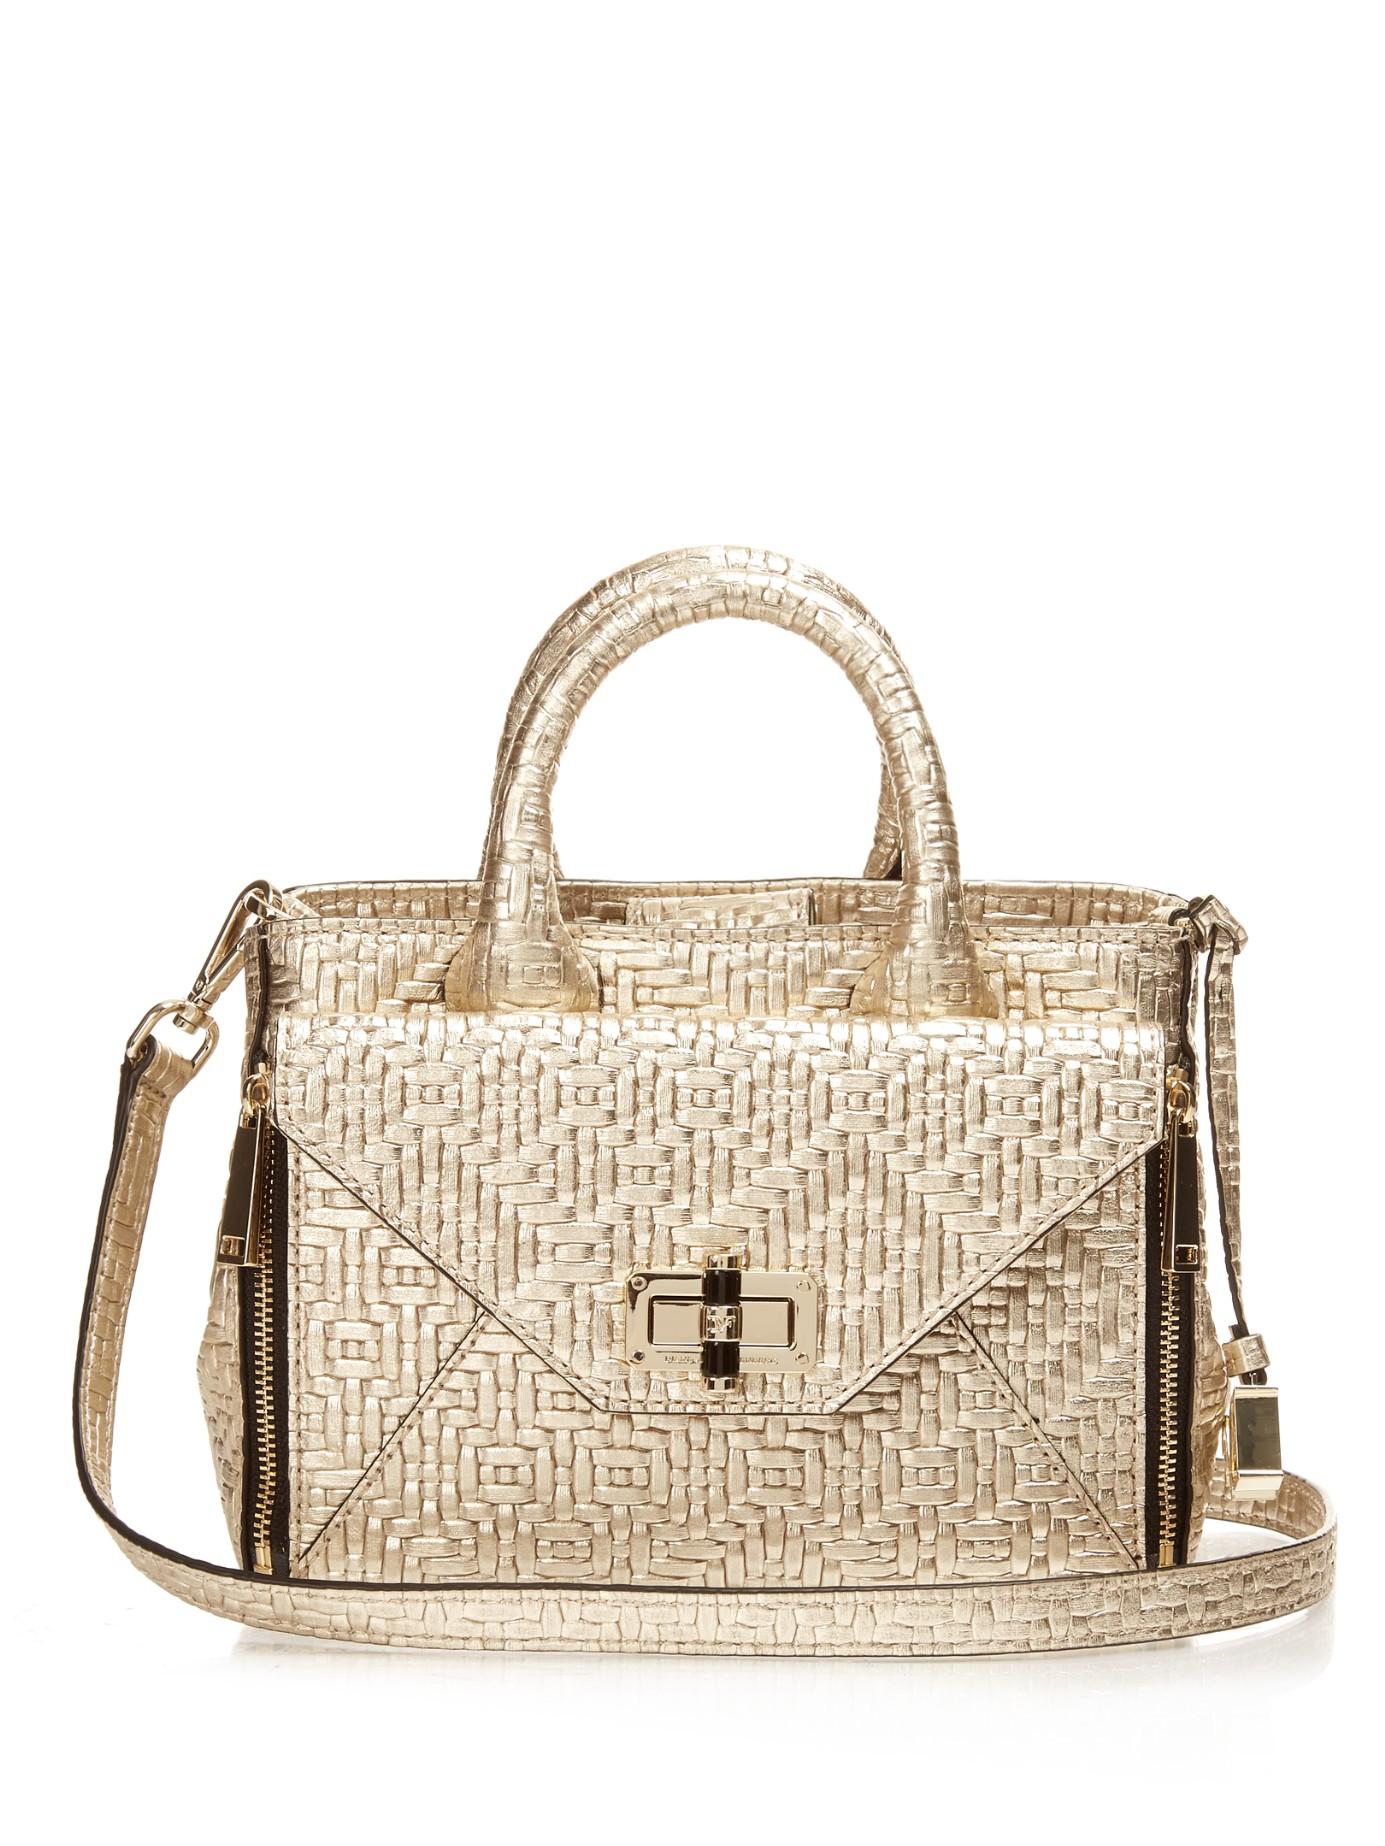 32f10725ca64 Diane von Furstenberg Metallic 440 Gallery Mini Secret Agent Cross-body Bag